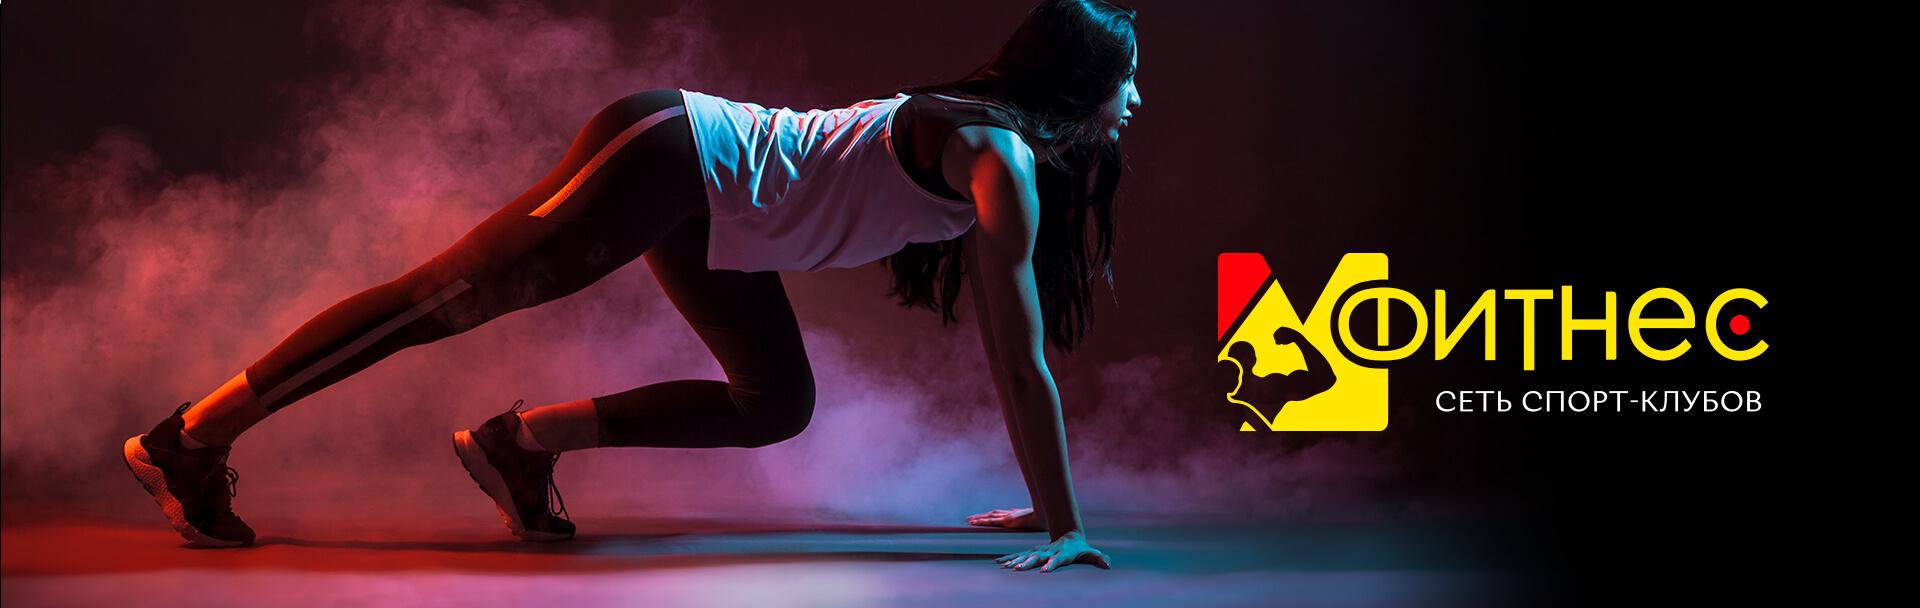 Лендинг для сети фитнес-клубов «Мфитнес»